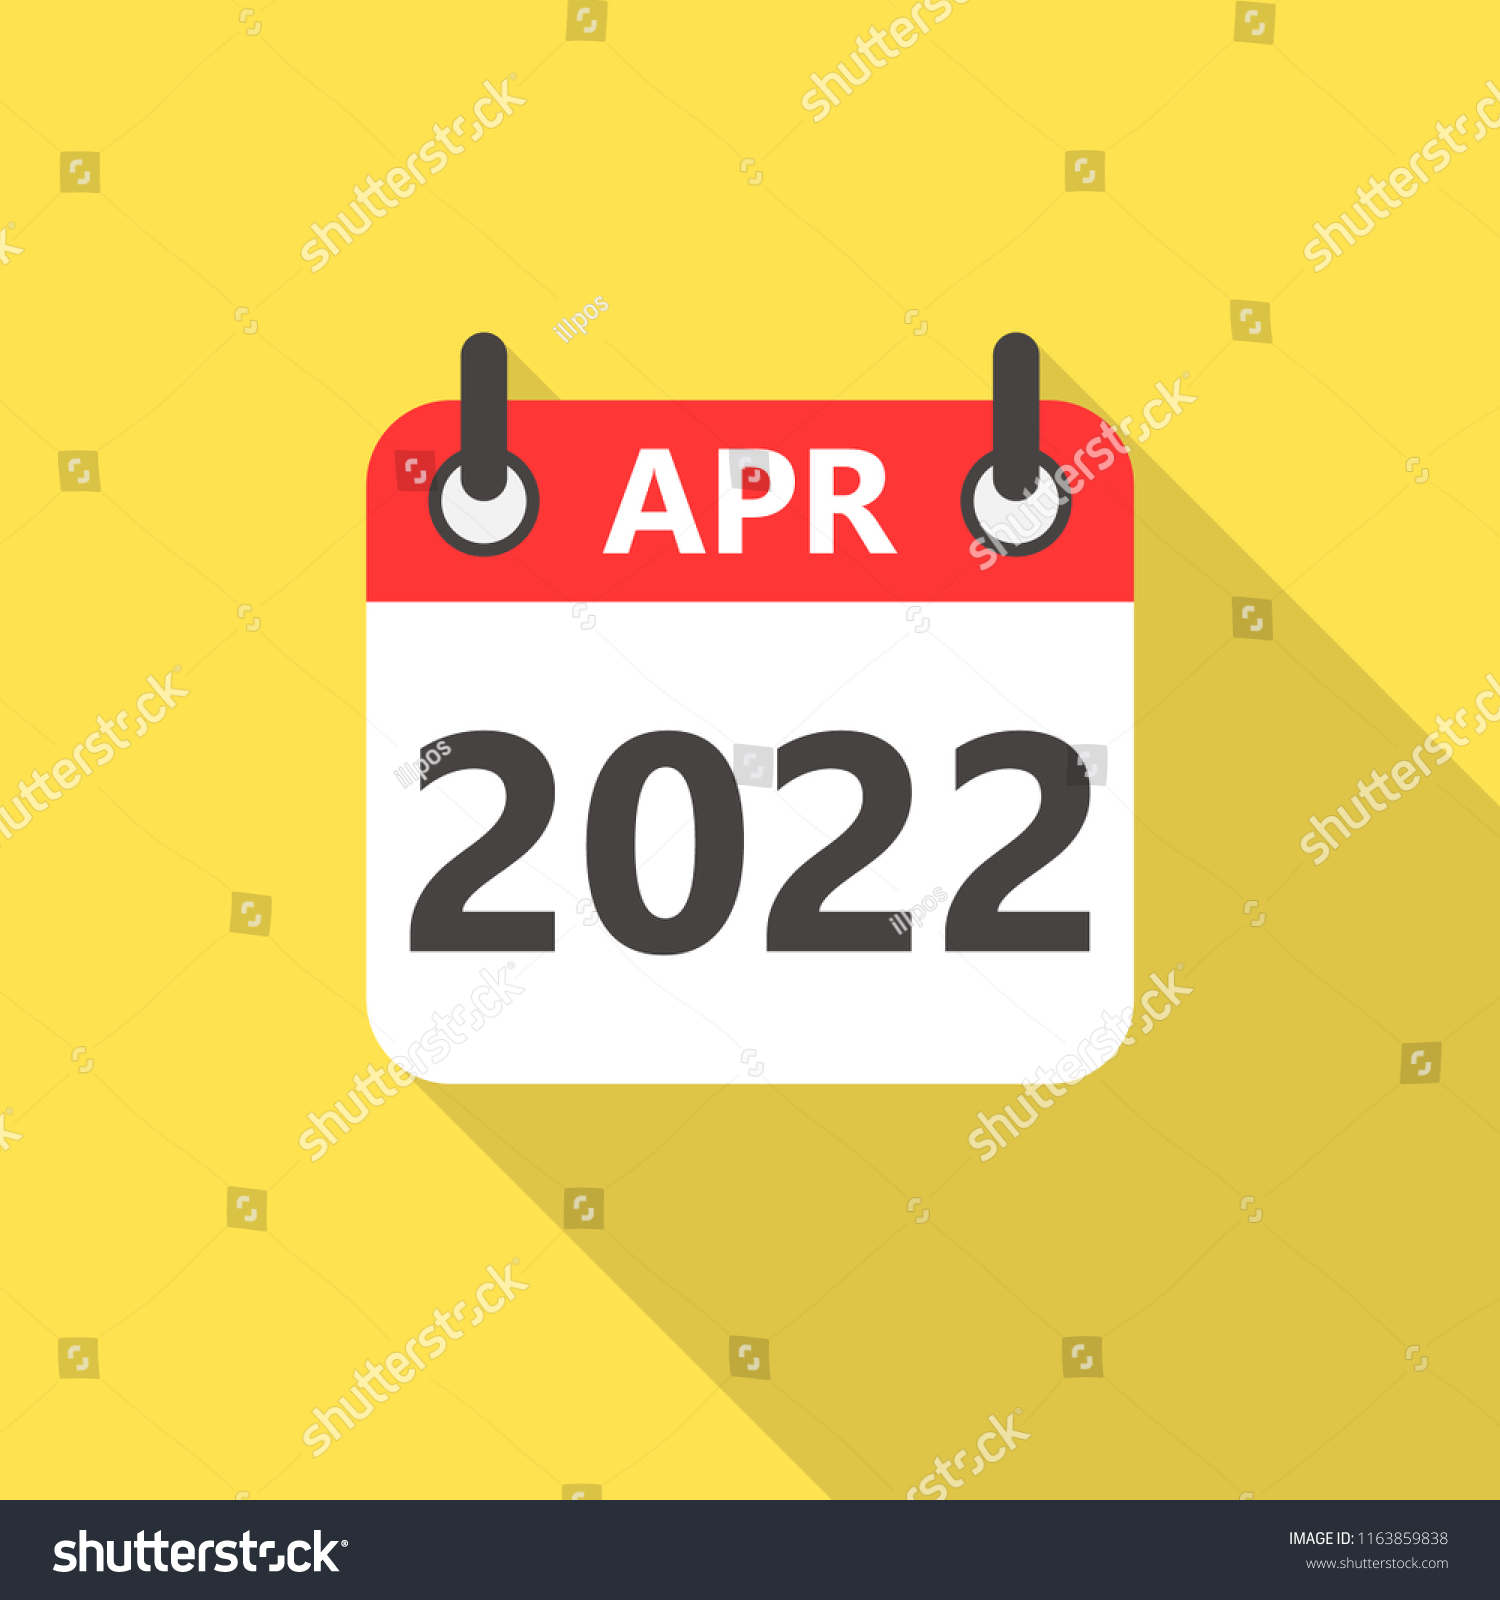 Calendar 2022 April.April 2022 Calendar Flat Style Icon Stock Vector Royalty Free 1163859838